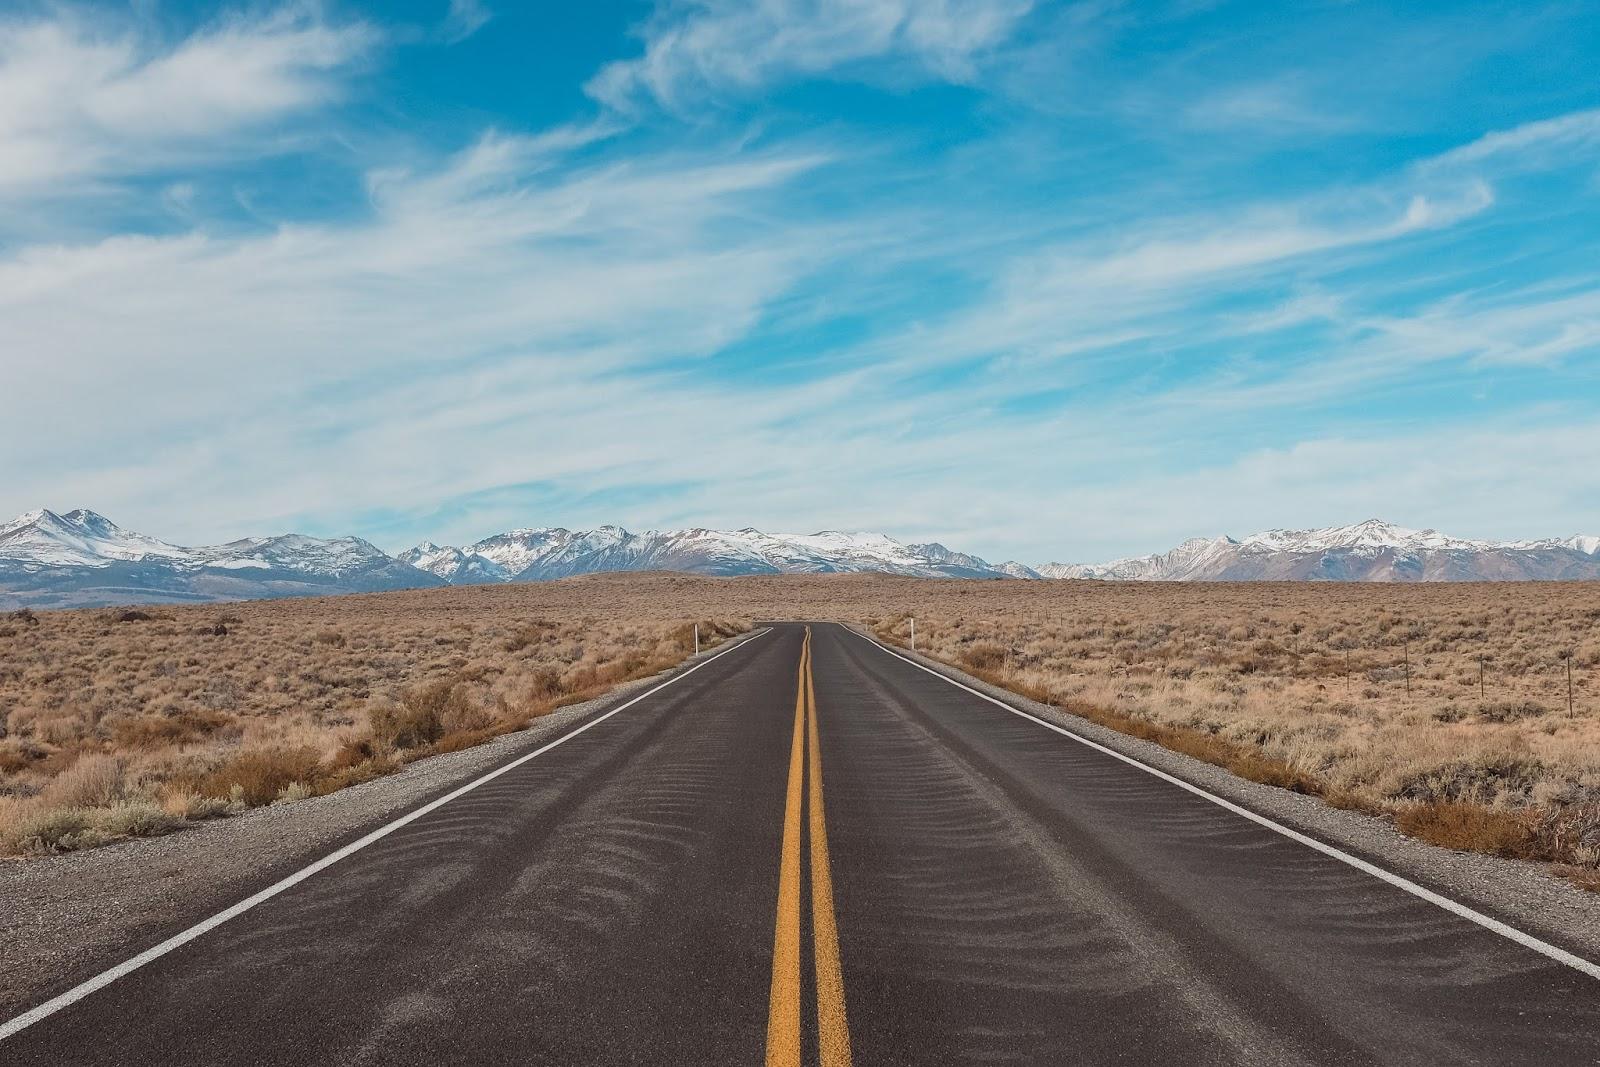 Road in Desert Place Landscape | Desktop Wallpaper Road